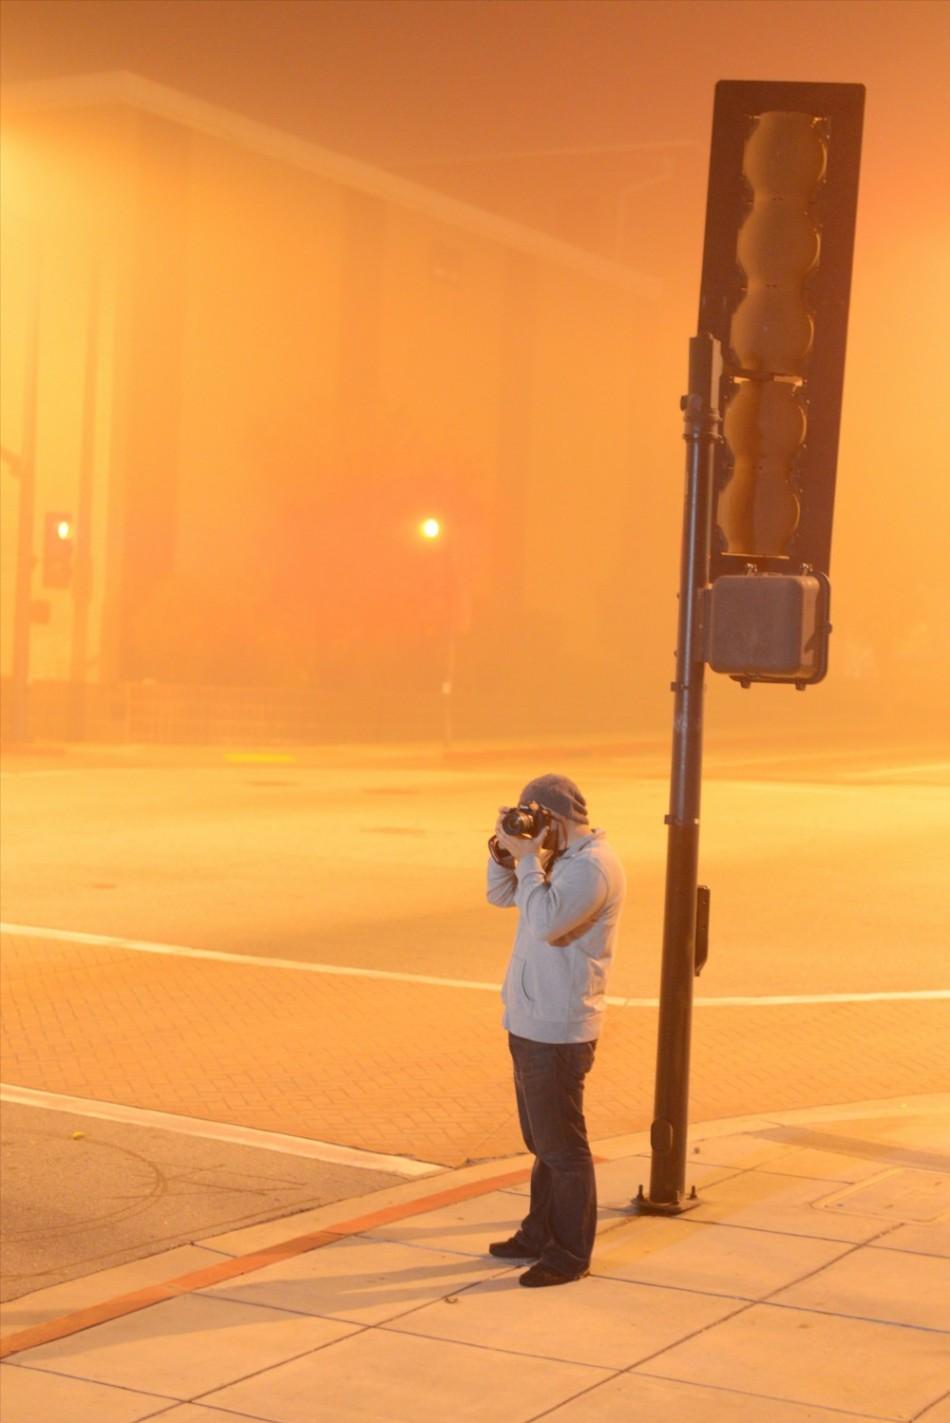 Street Light made the fog glow orange